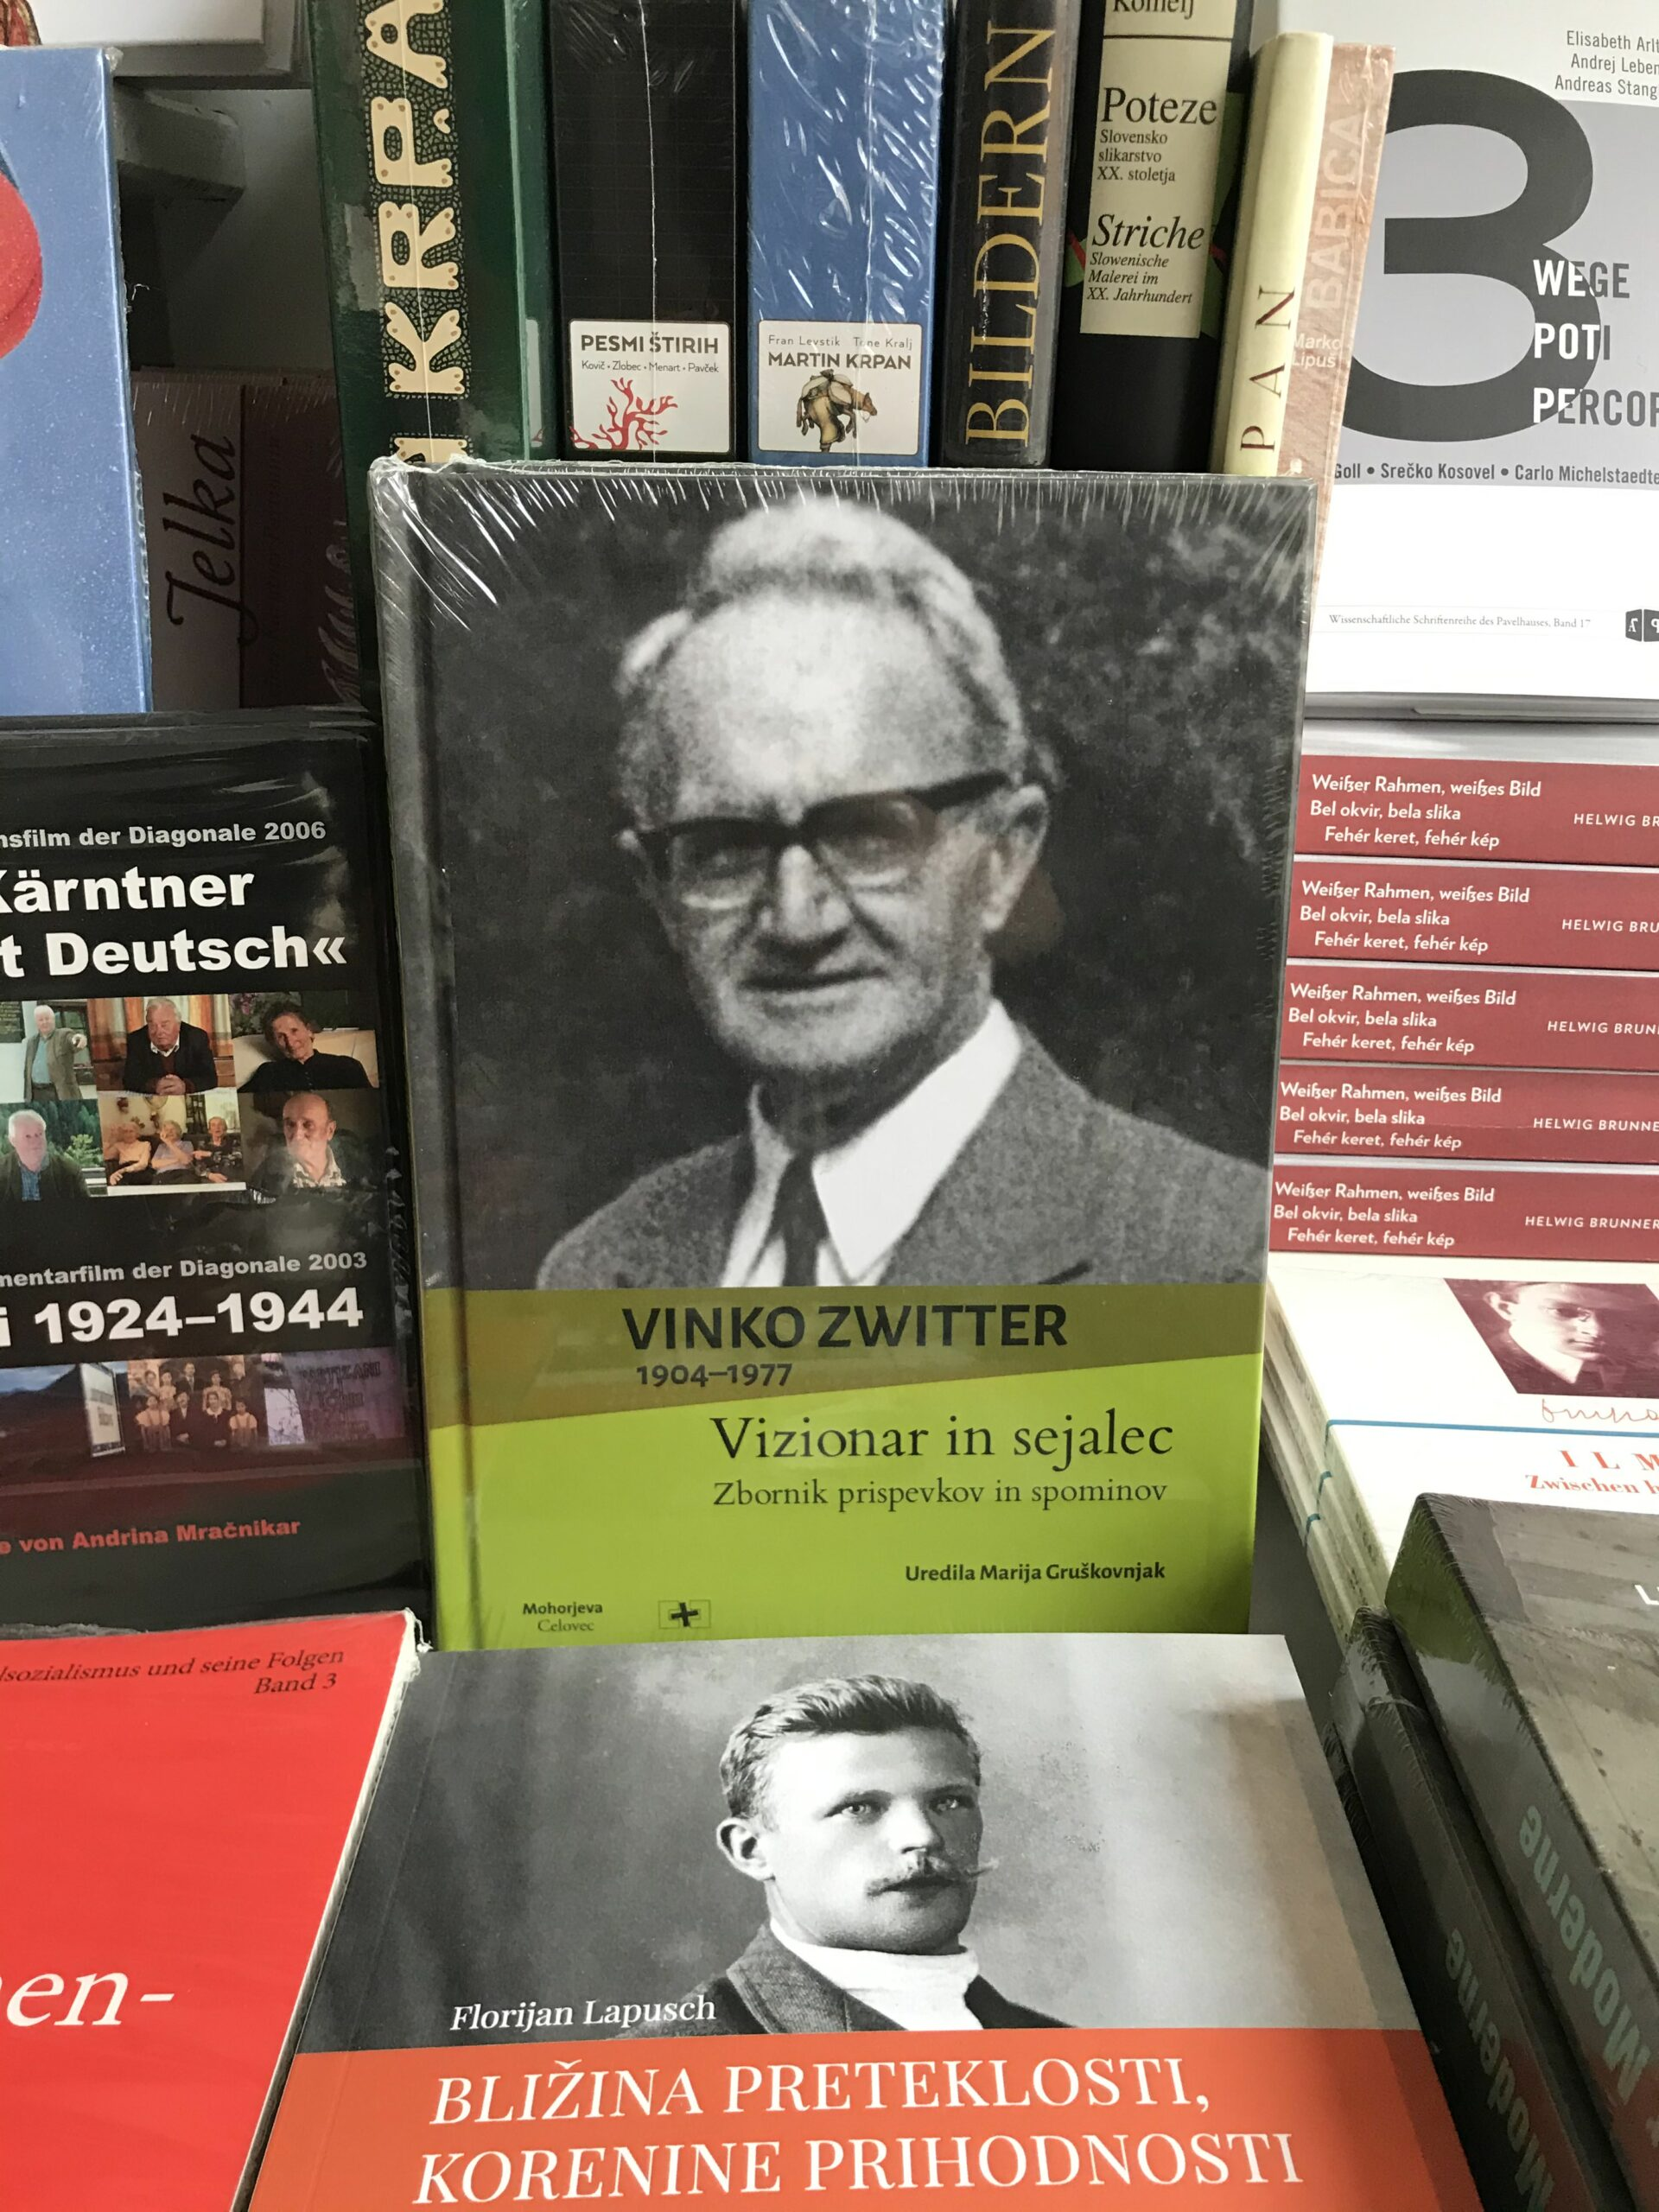 Vinko Zwitter 1904-1977